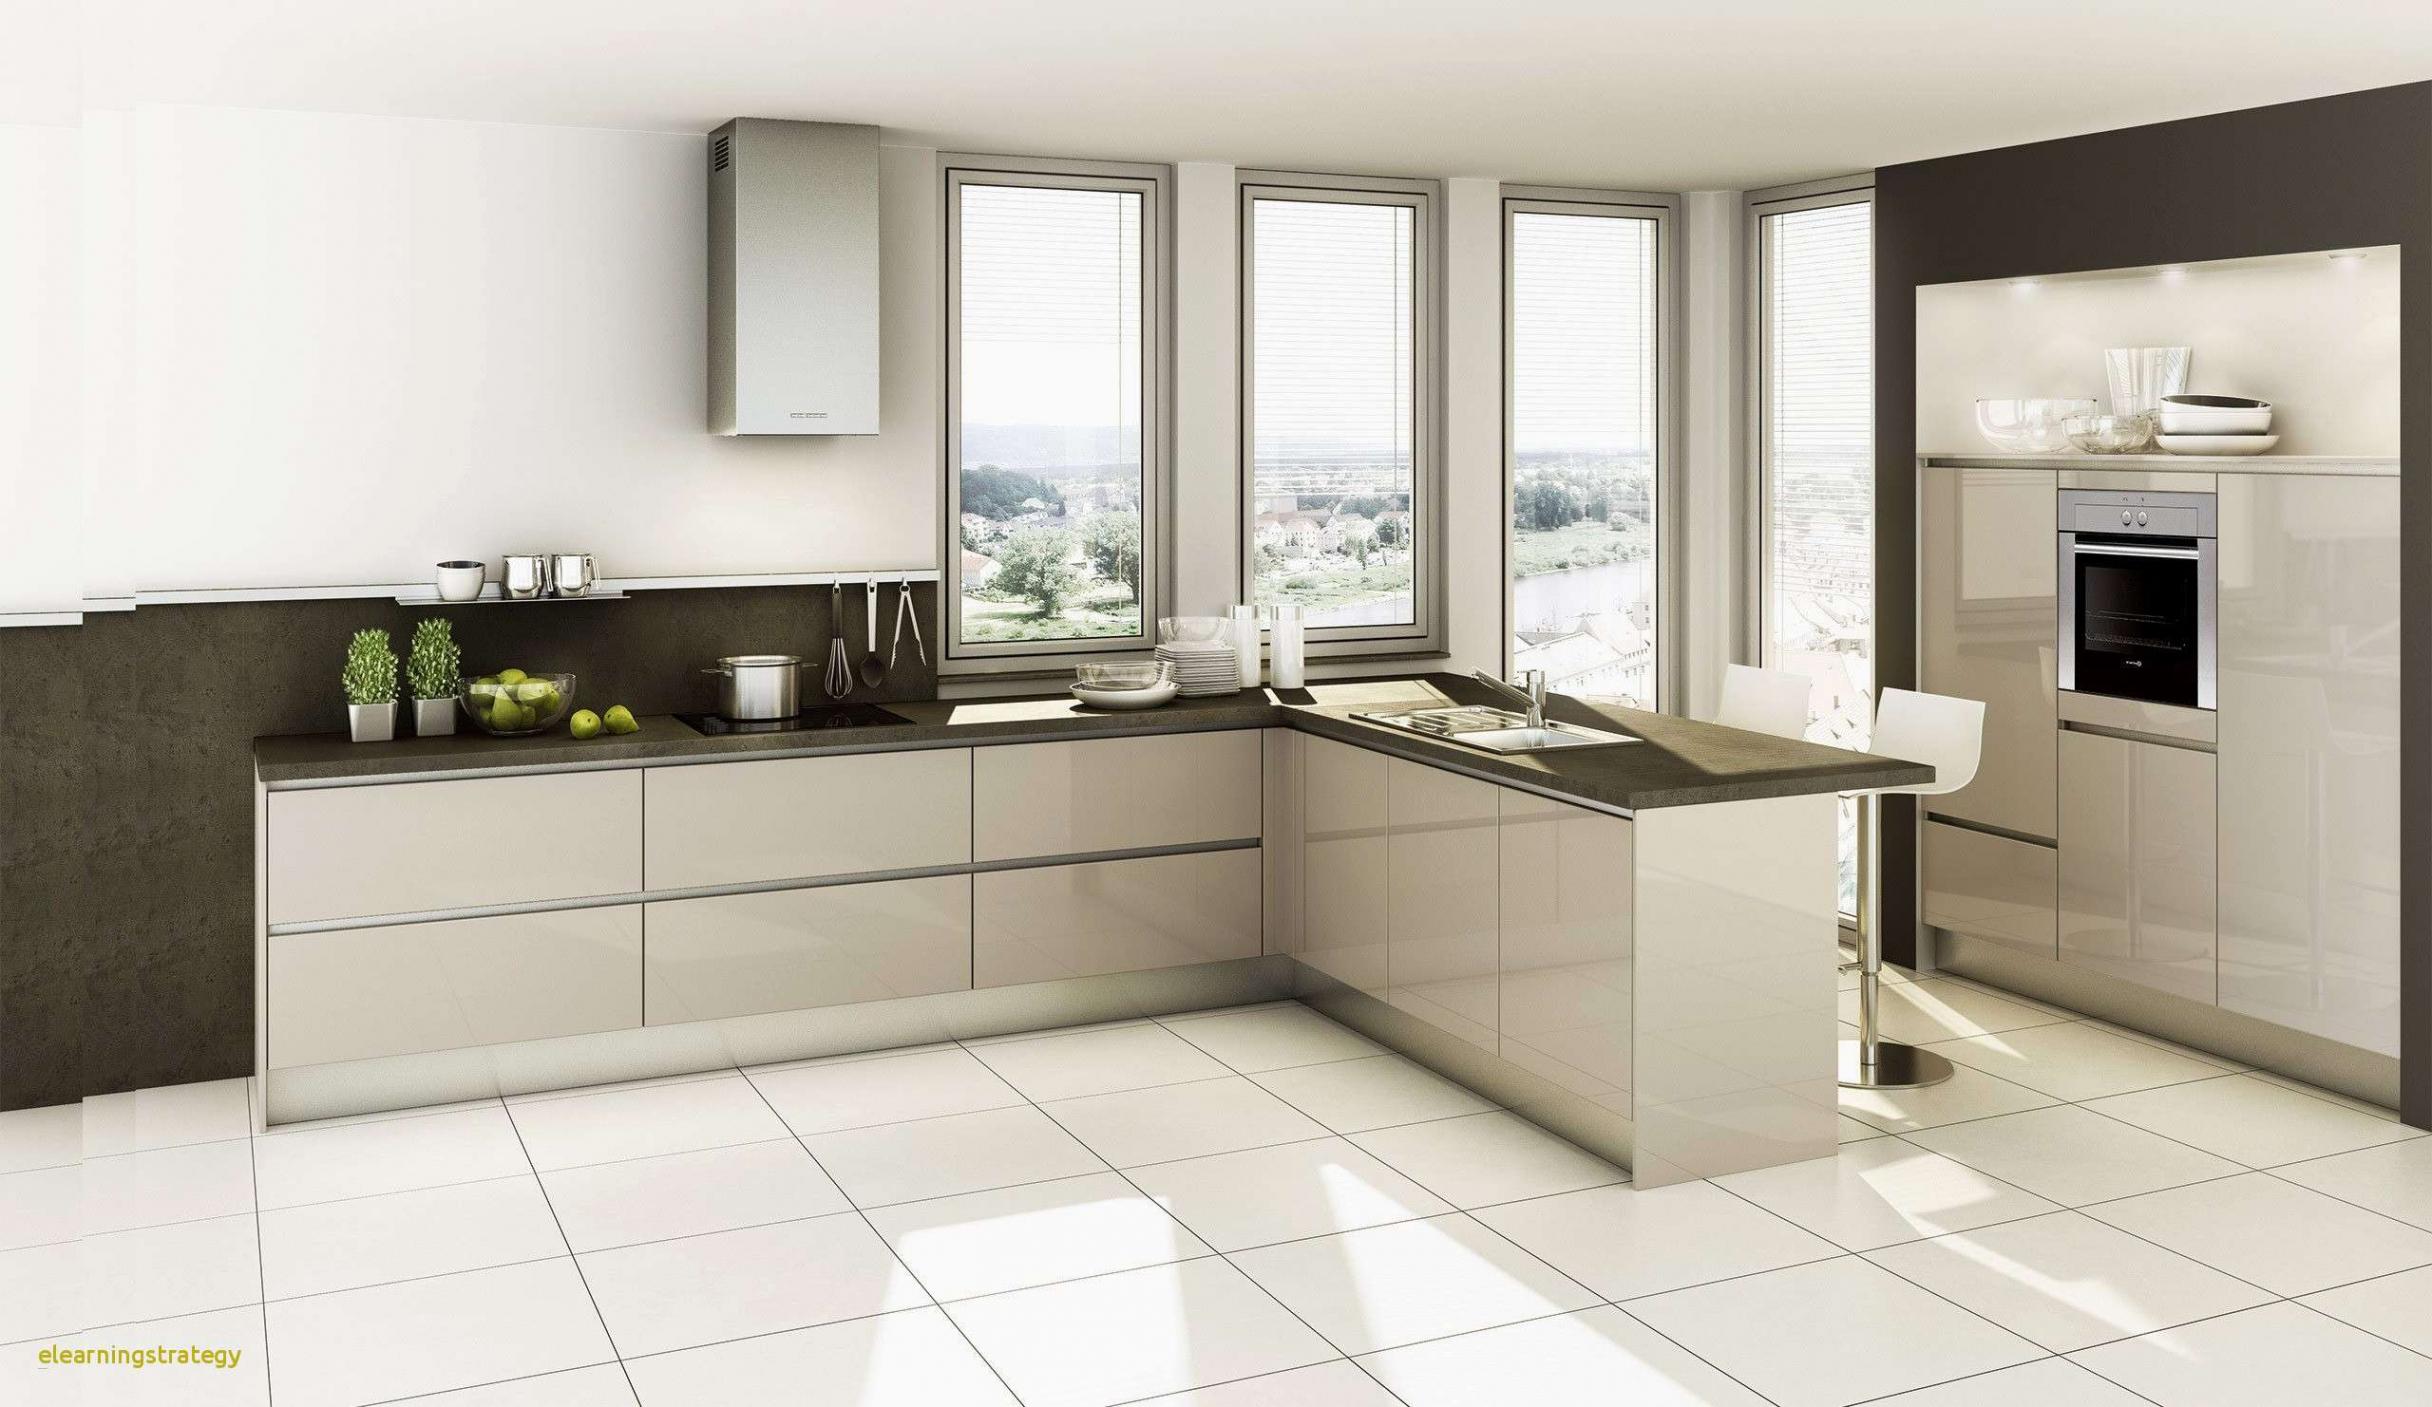 45 luxus deko ideen kuche galerie kuchen fur dachgeschosswohnungen kuchen fur dachgeschosswohnungen 3